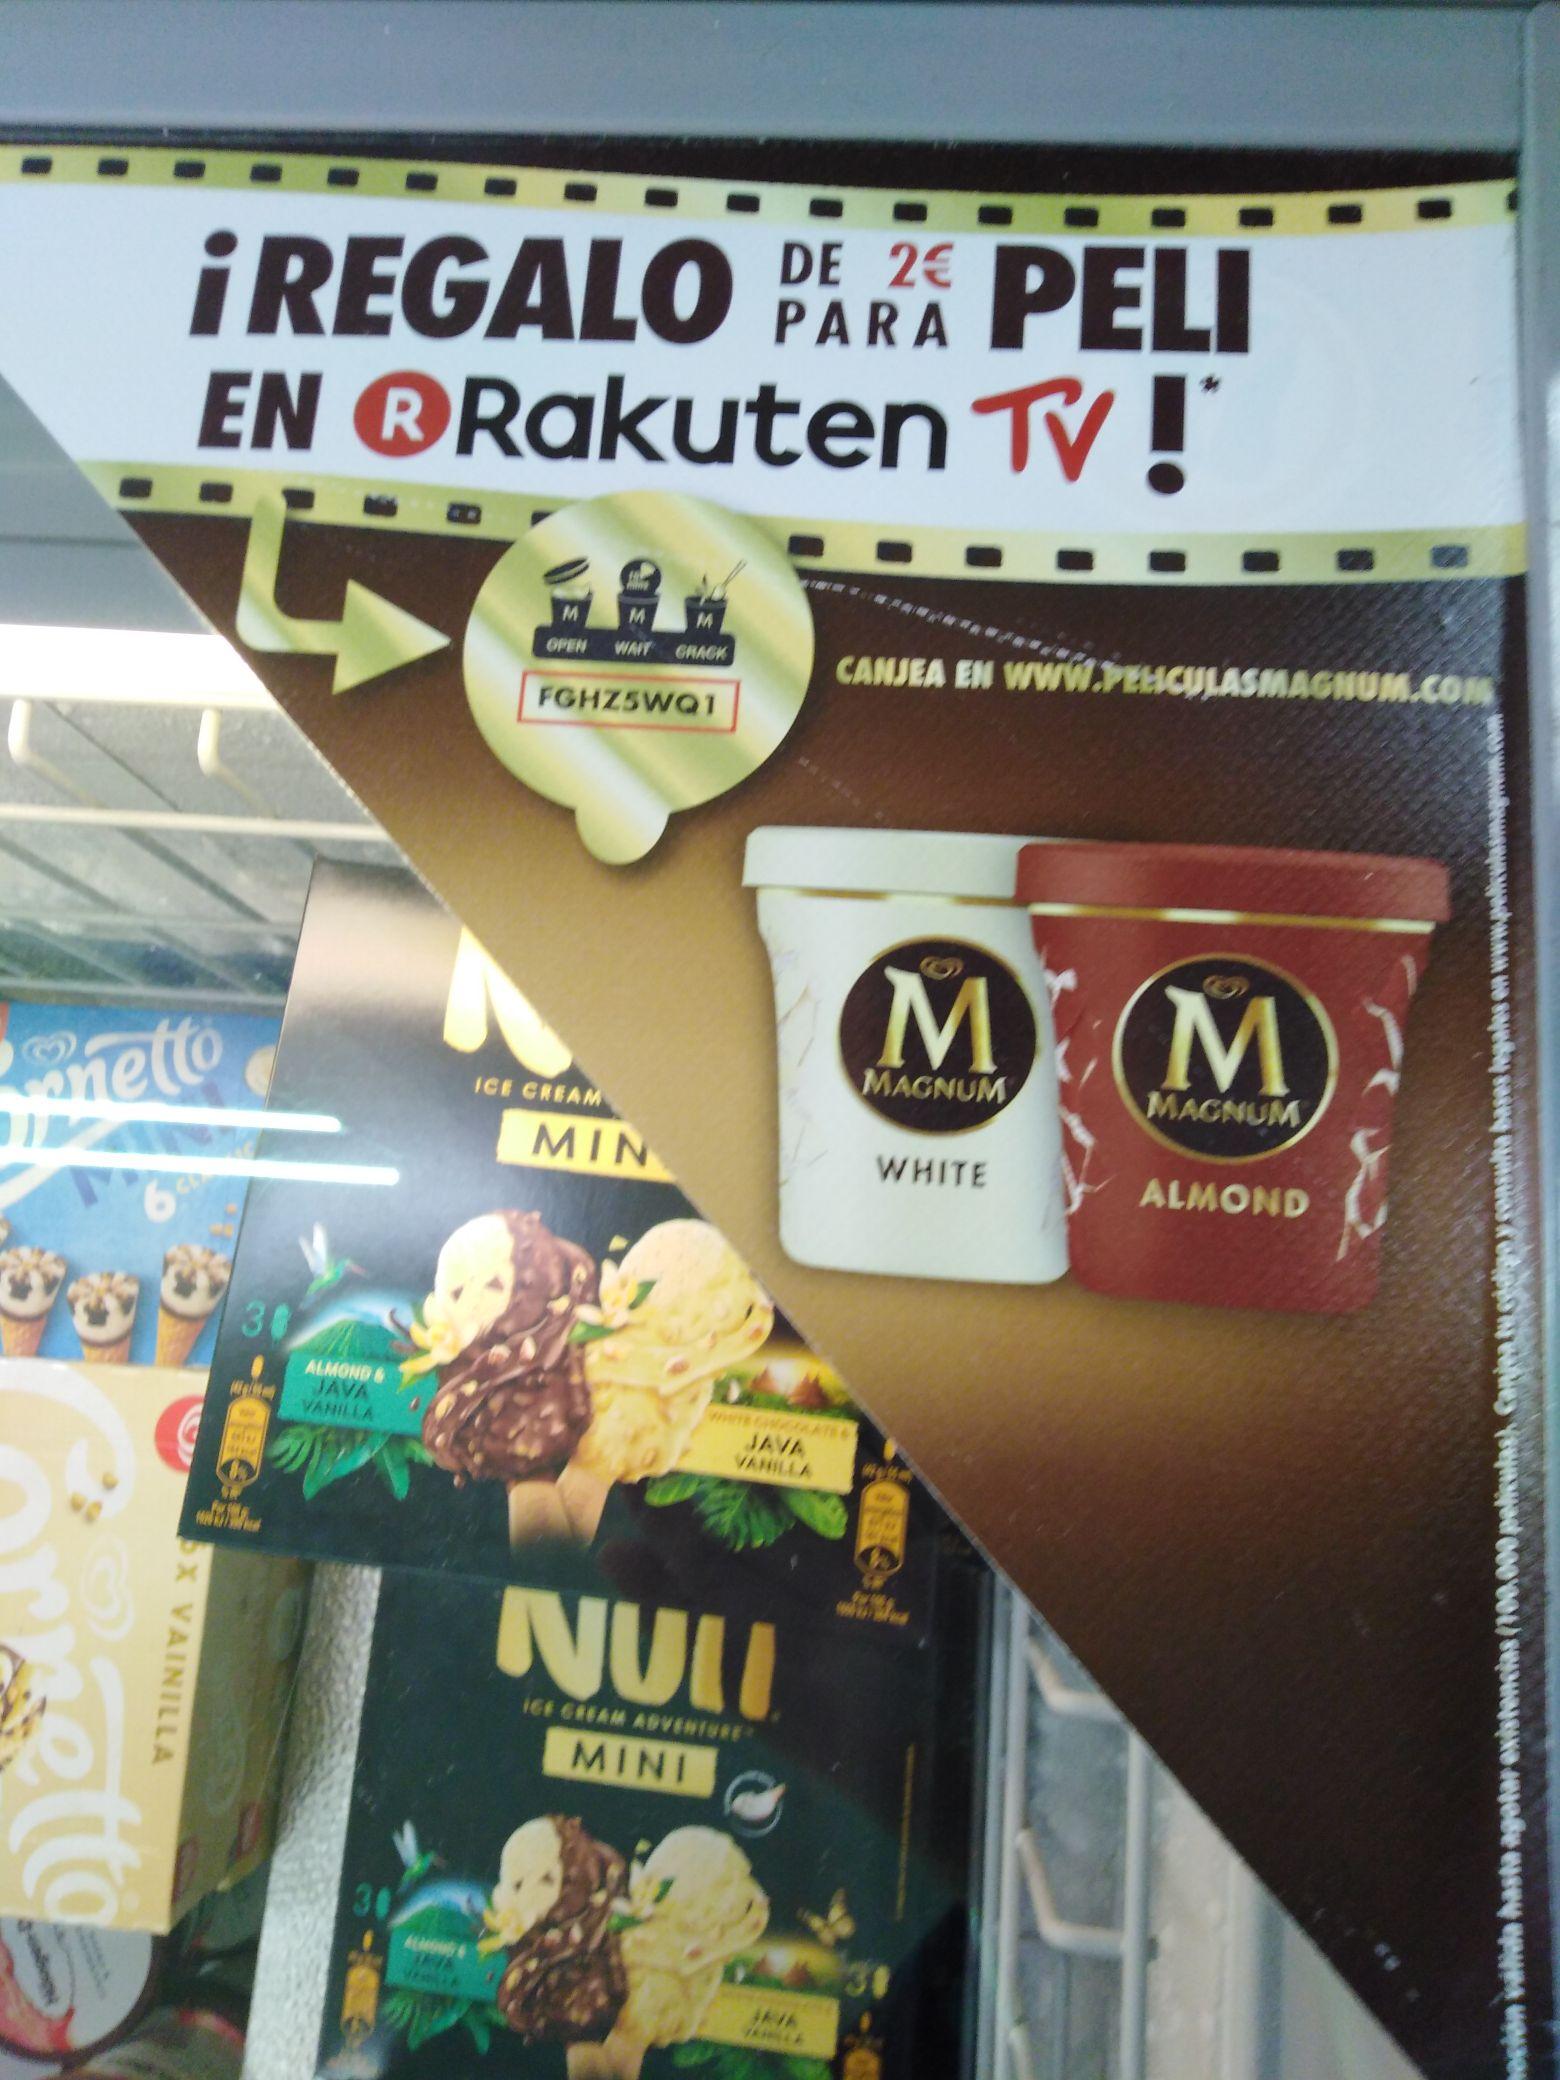 2€ en películas en Rakuten